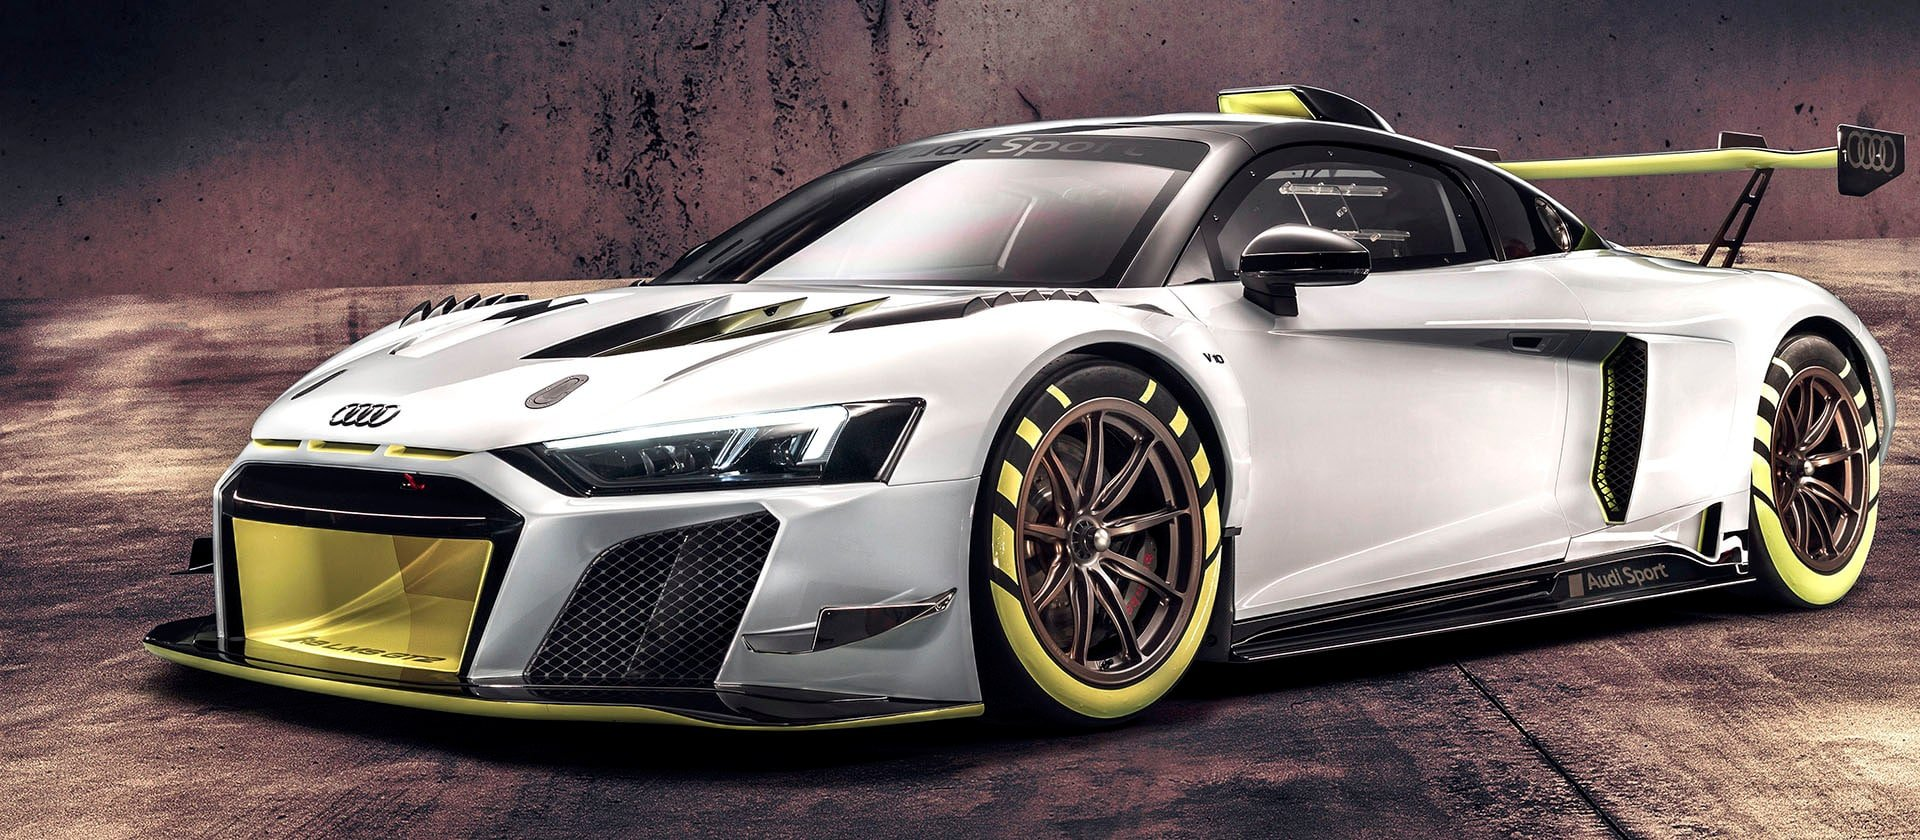 Audi R8 Lms Gt2 2019 1920x840